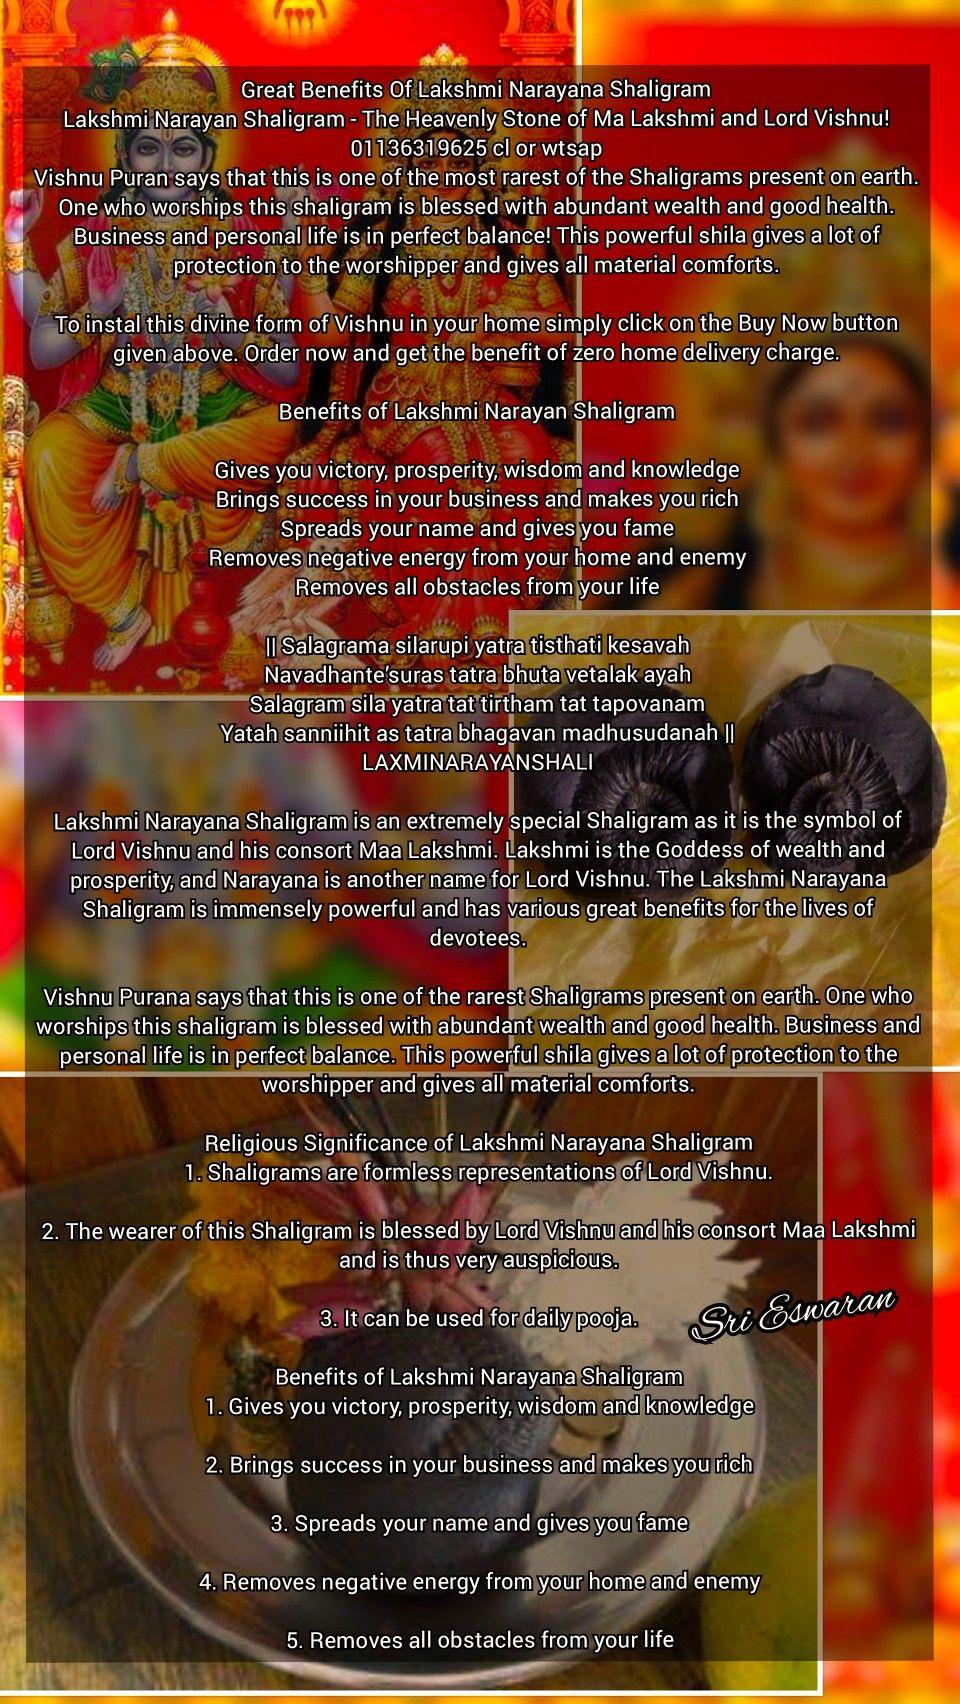 Great Benefits Of Lakshmi Narayana Shaligram Lakshmi Narayan